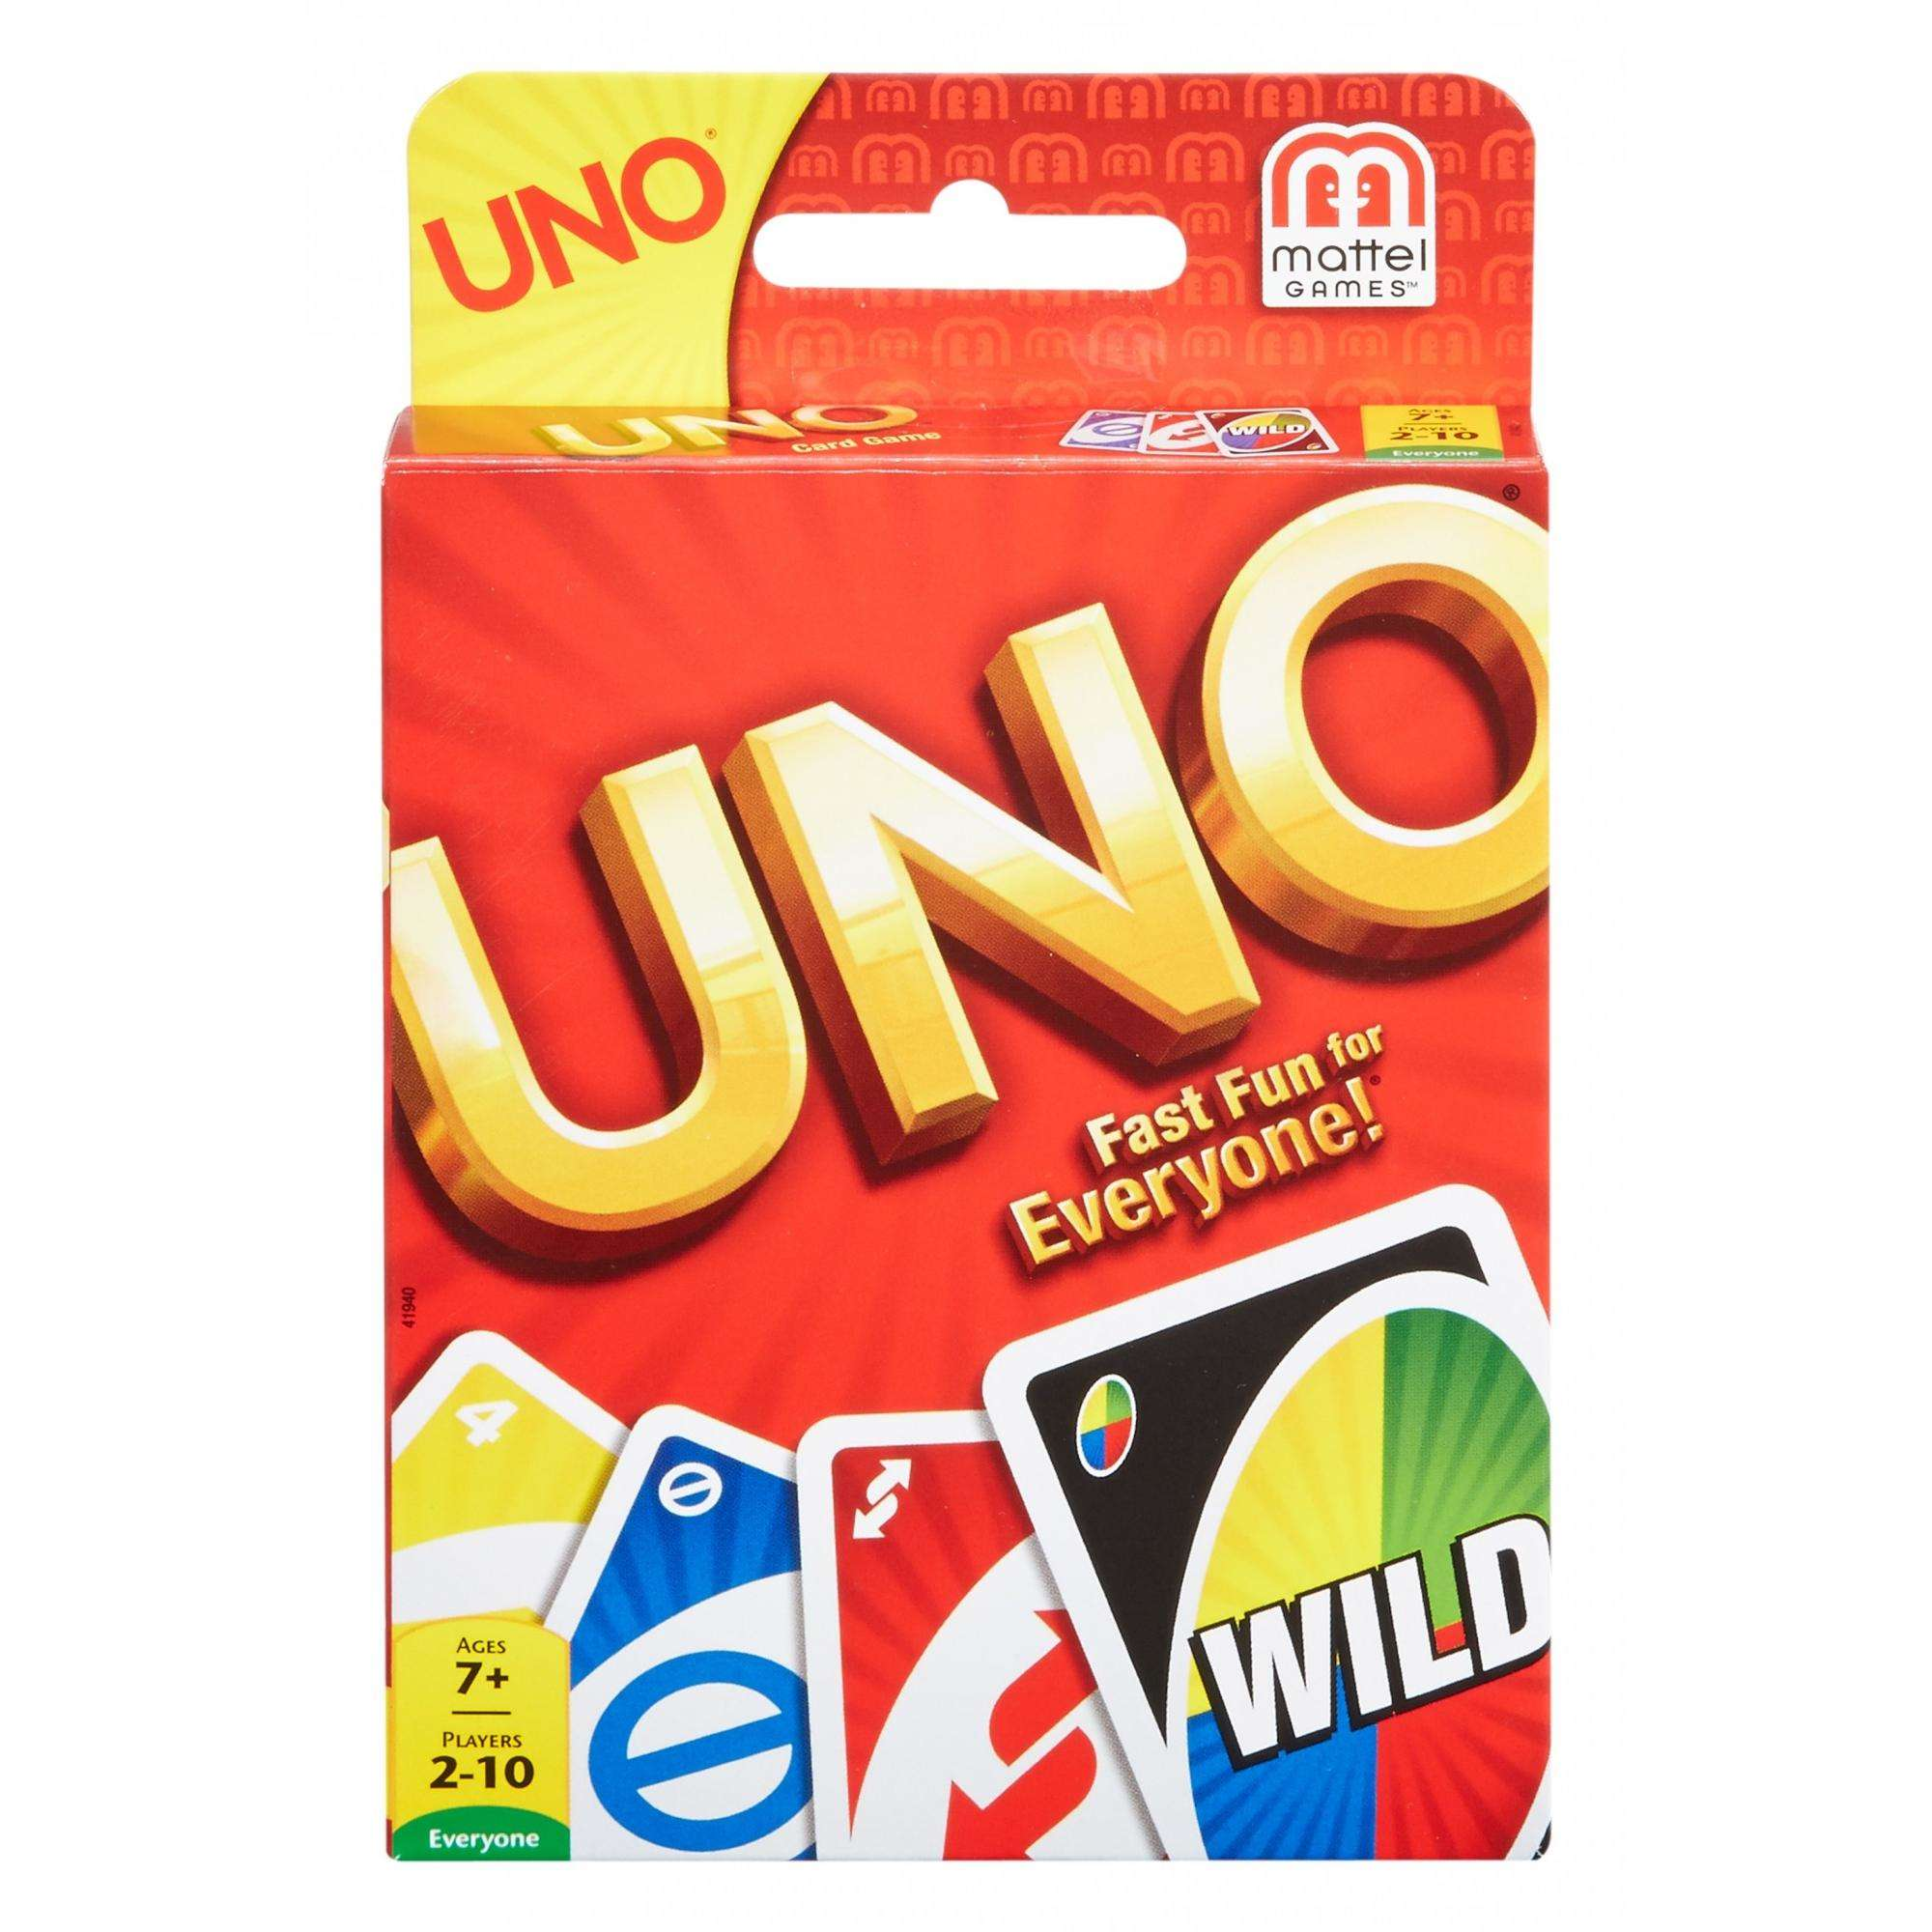 🛒- Walmart- Uno Card Game